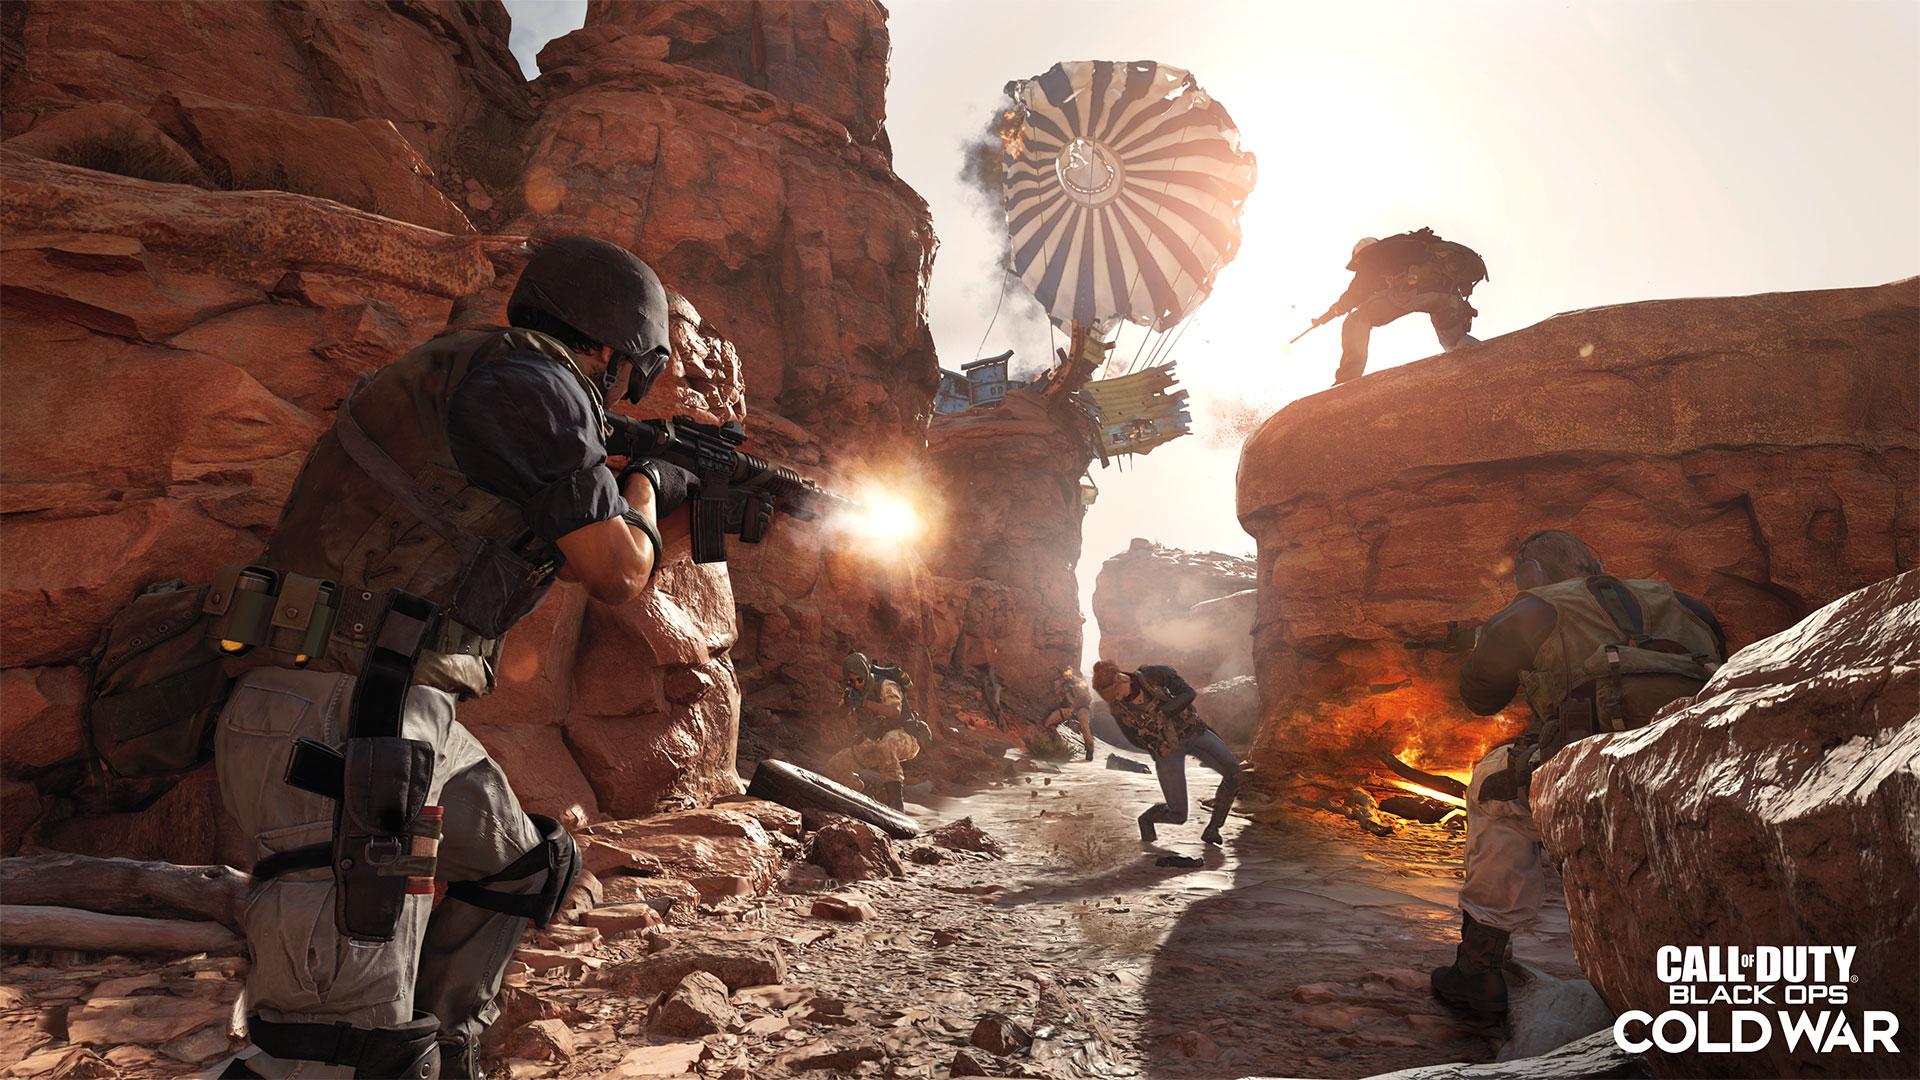 Call Of Duty Black Ops Cold War Beta Dates Confirmed Egm